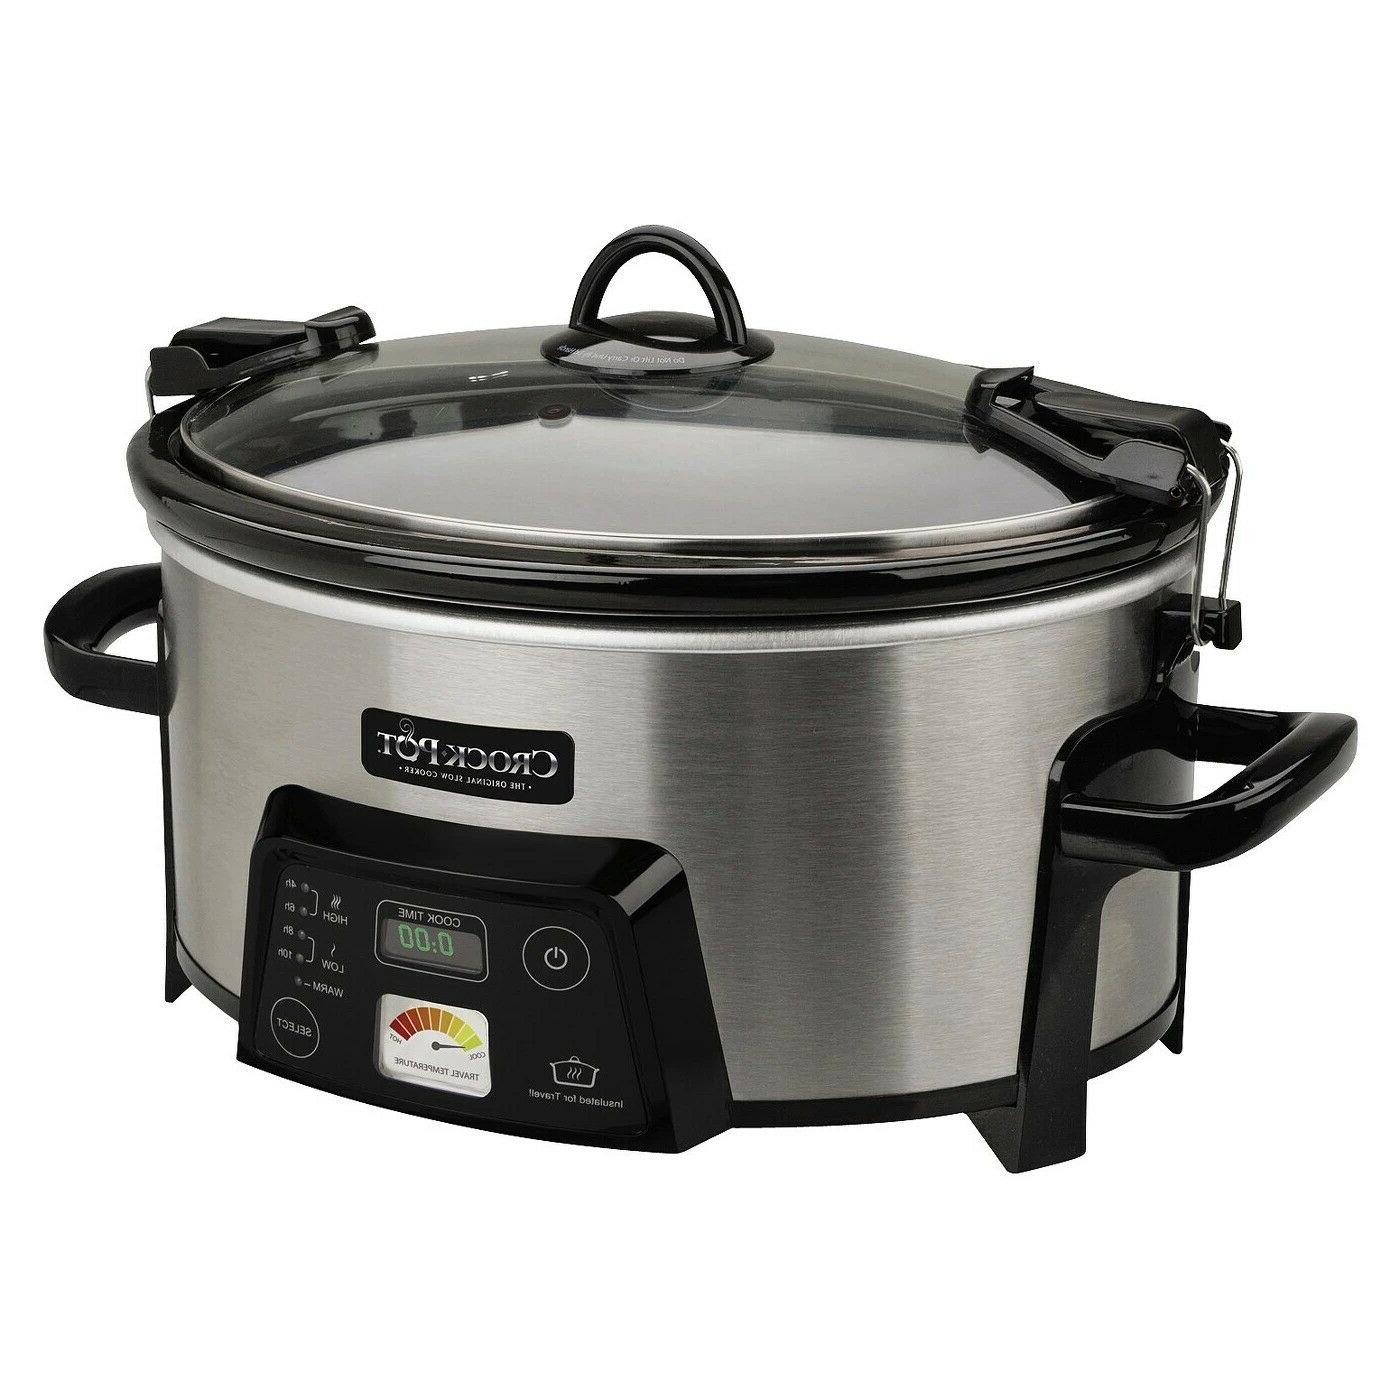 Crock-Pot Cook & Carry Digital Slow Heat St